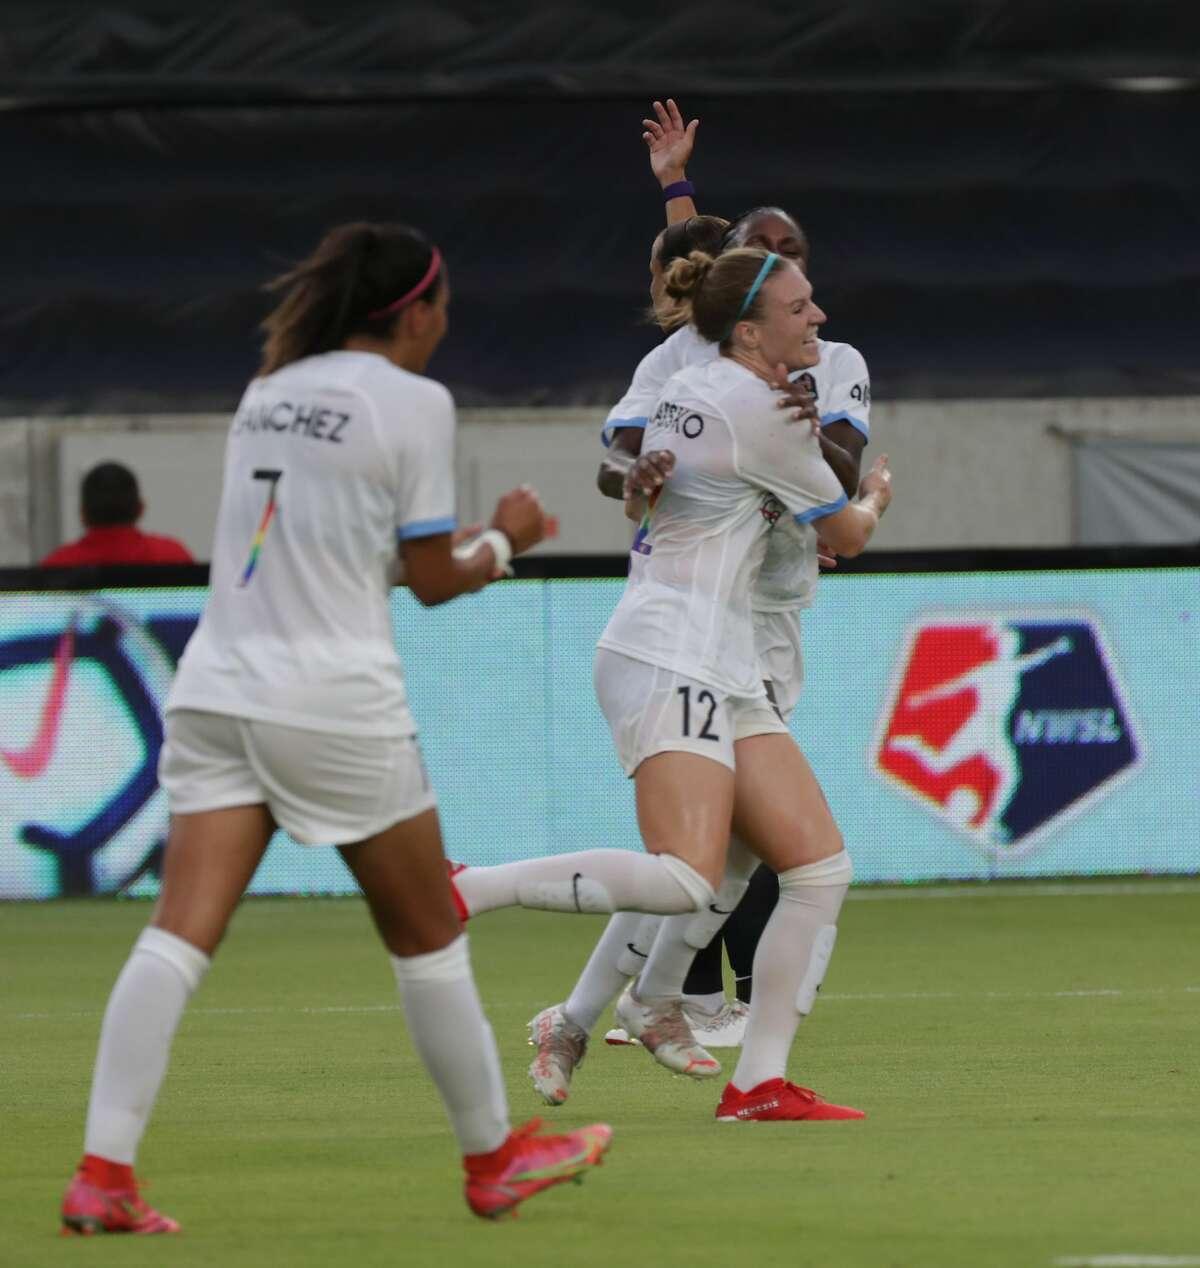 Houston Dash forward Veronica Latsko (12) celebrates after scoring a goal during the first half match at BBVA Compass Stadium on Saturday, June 26, 2021, in Houston.